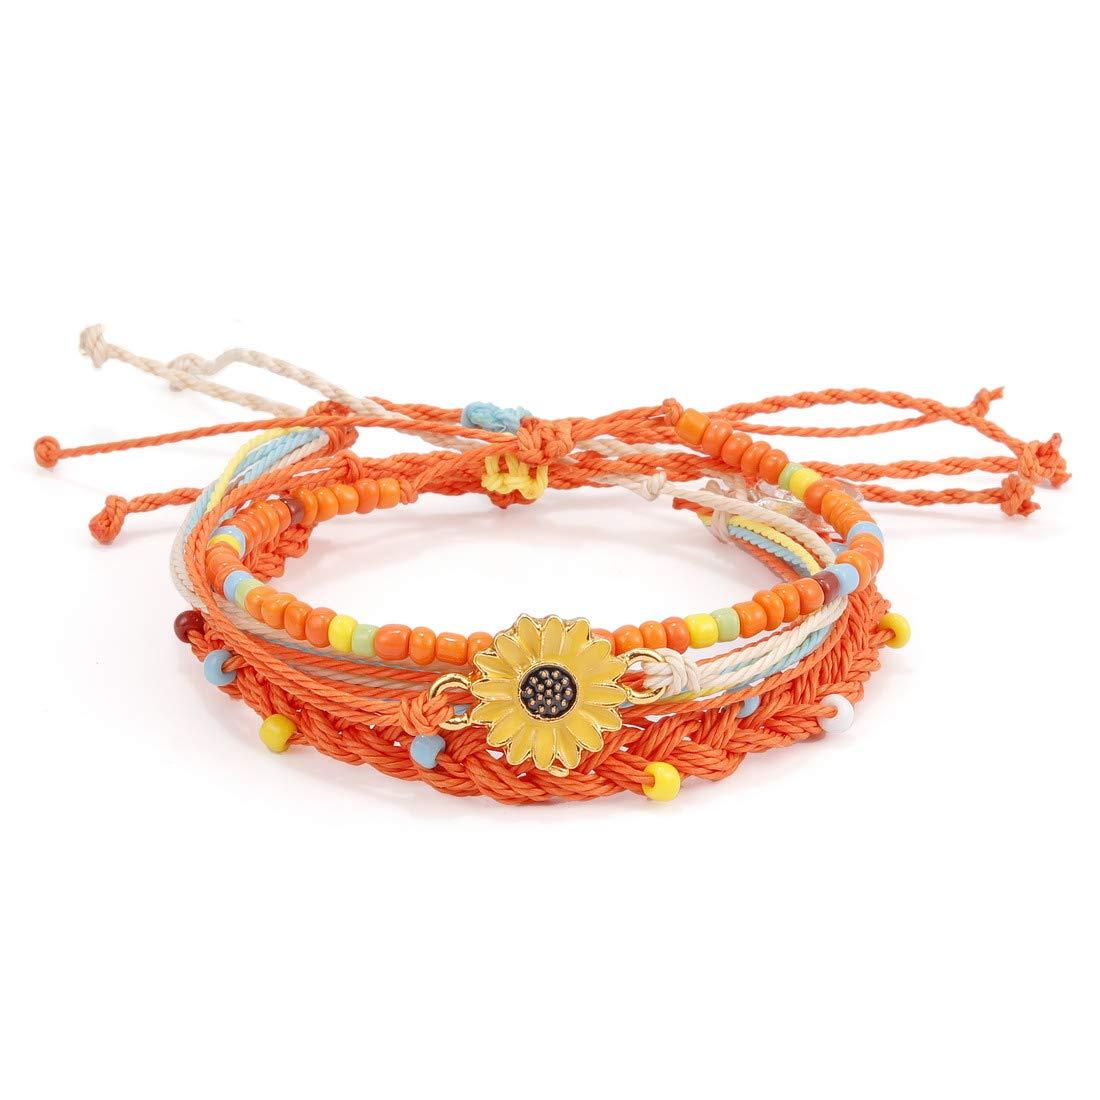 Pengruizhi Sun Flower Handmade Waterproof Braided Jewelry Bracelet Wax Coated Wave Charm Beach Bracelets 4Pieces/Set,Adjustable Band